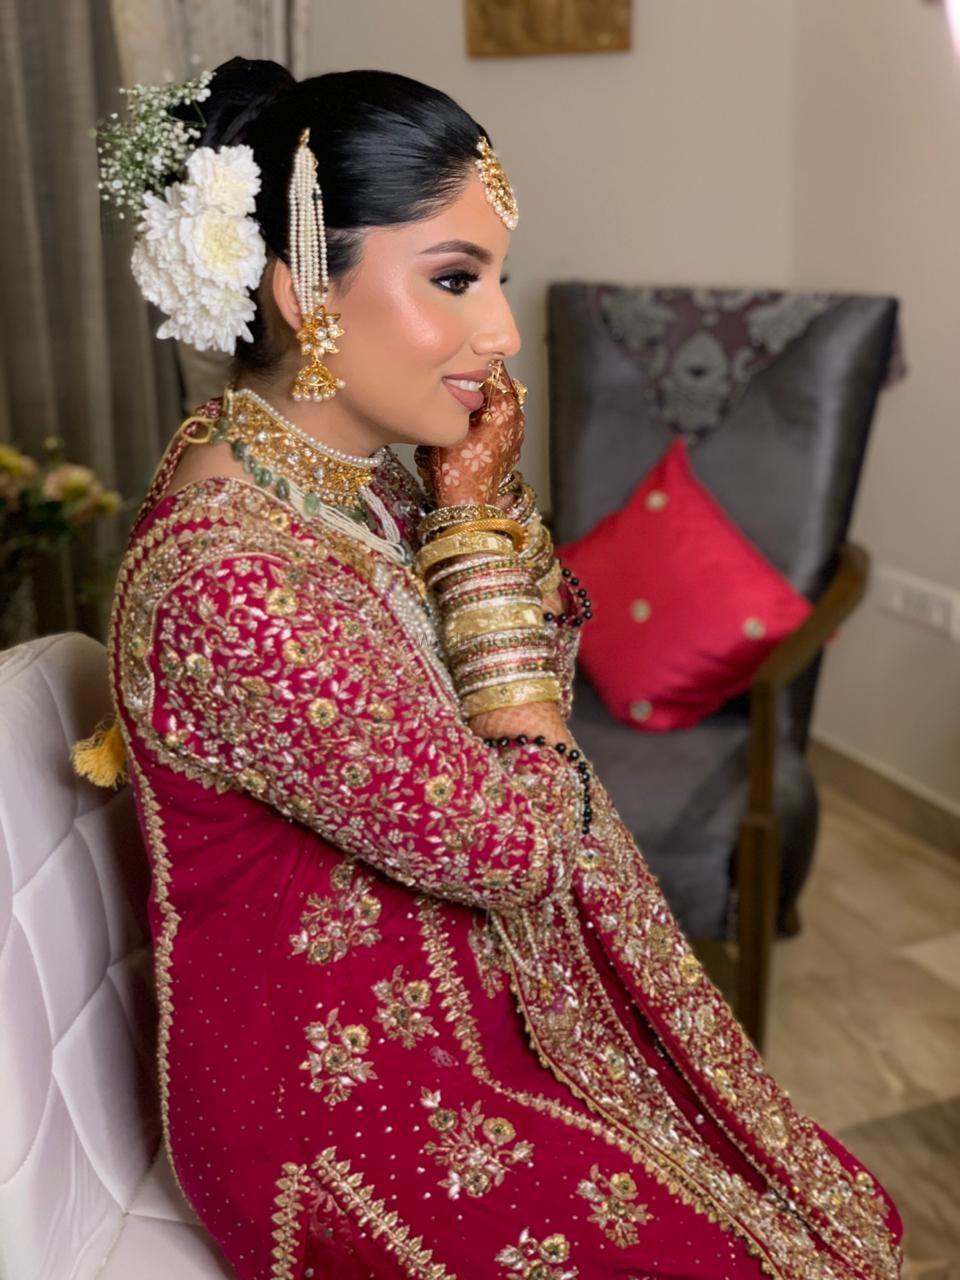 Photo From Muslim Brides - By Make-up by Afsha Rangila